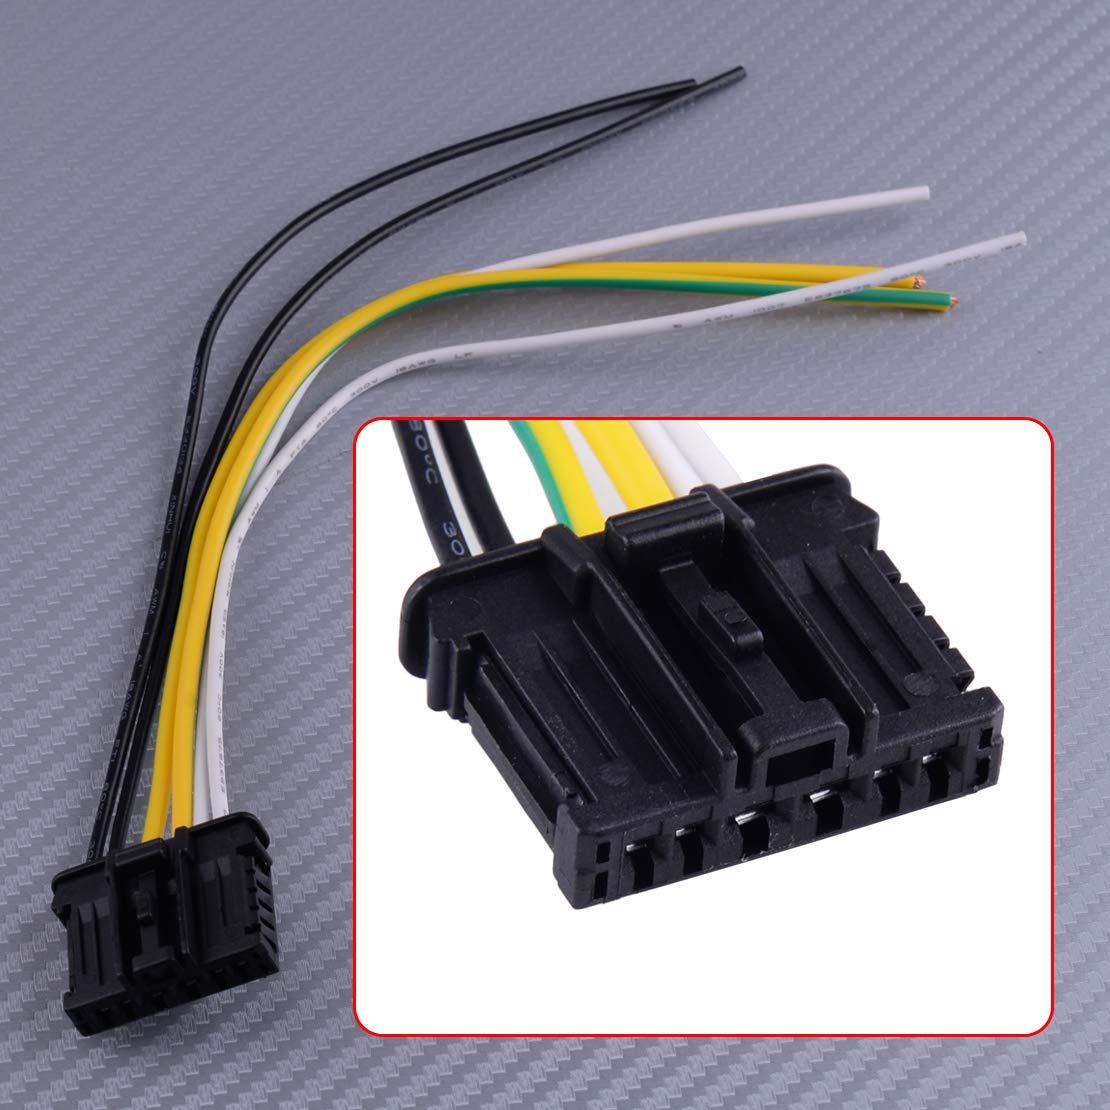 beler Connecteur de c/âblage de faisceau de feu arri/ère